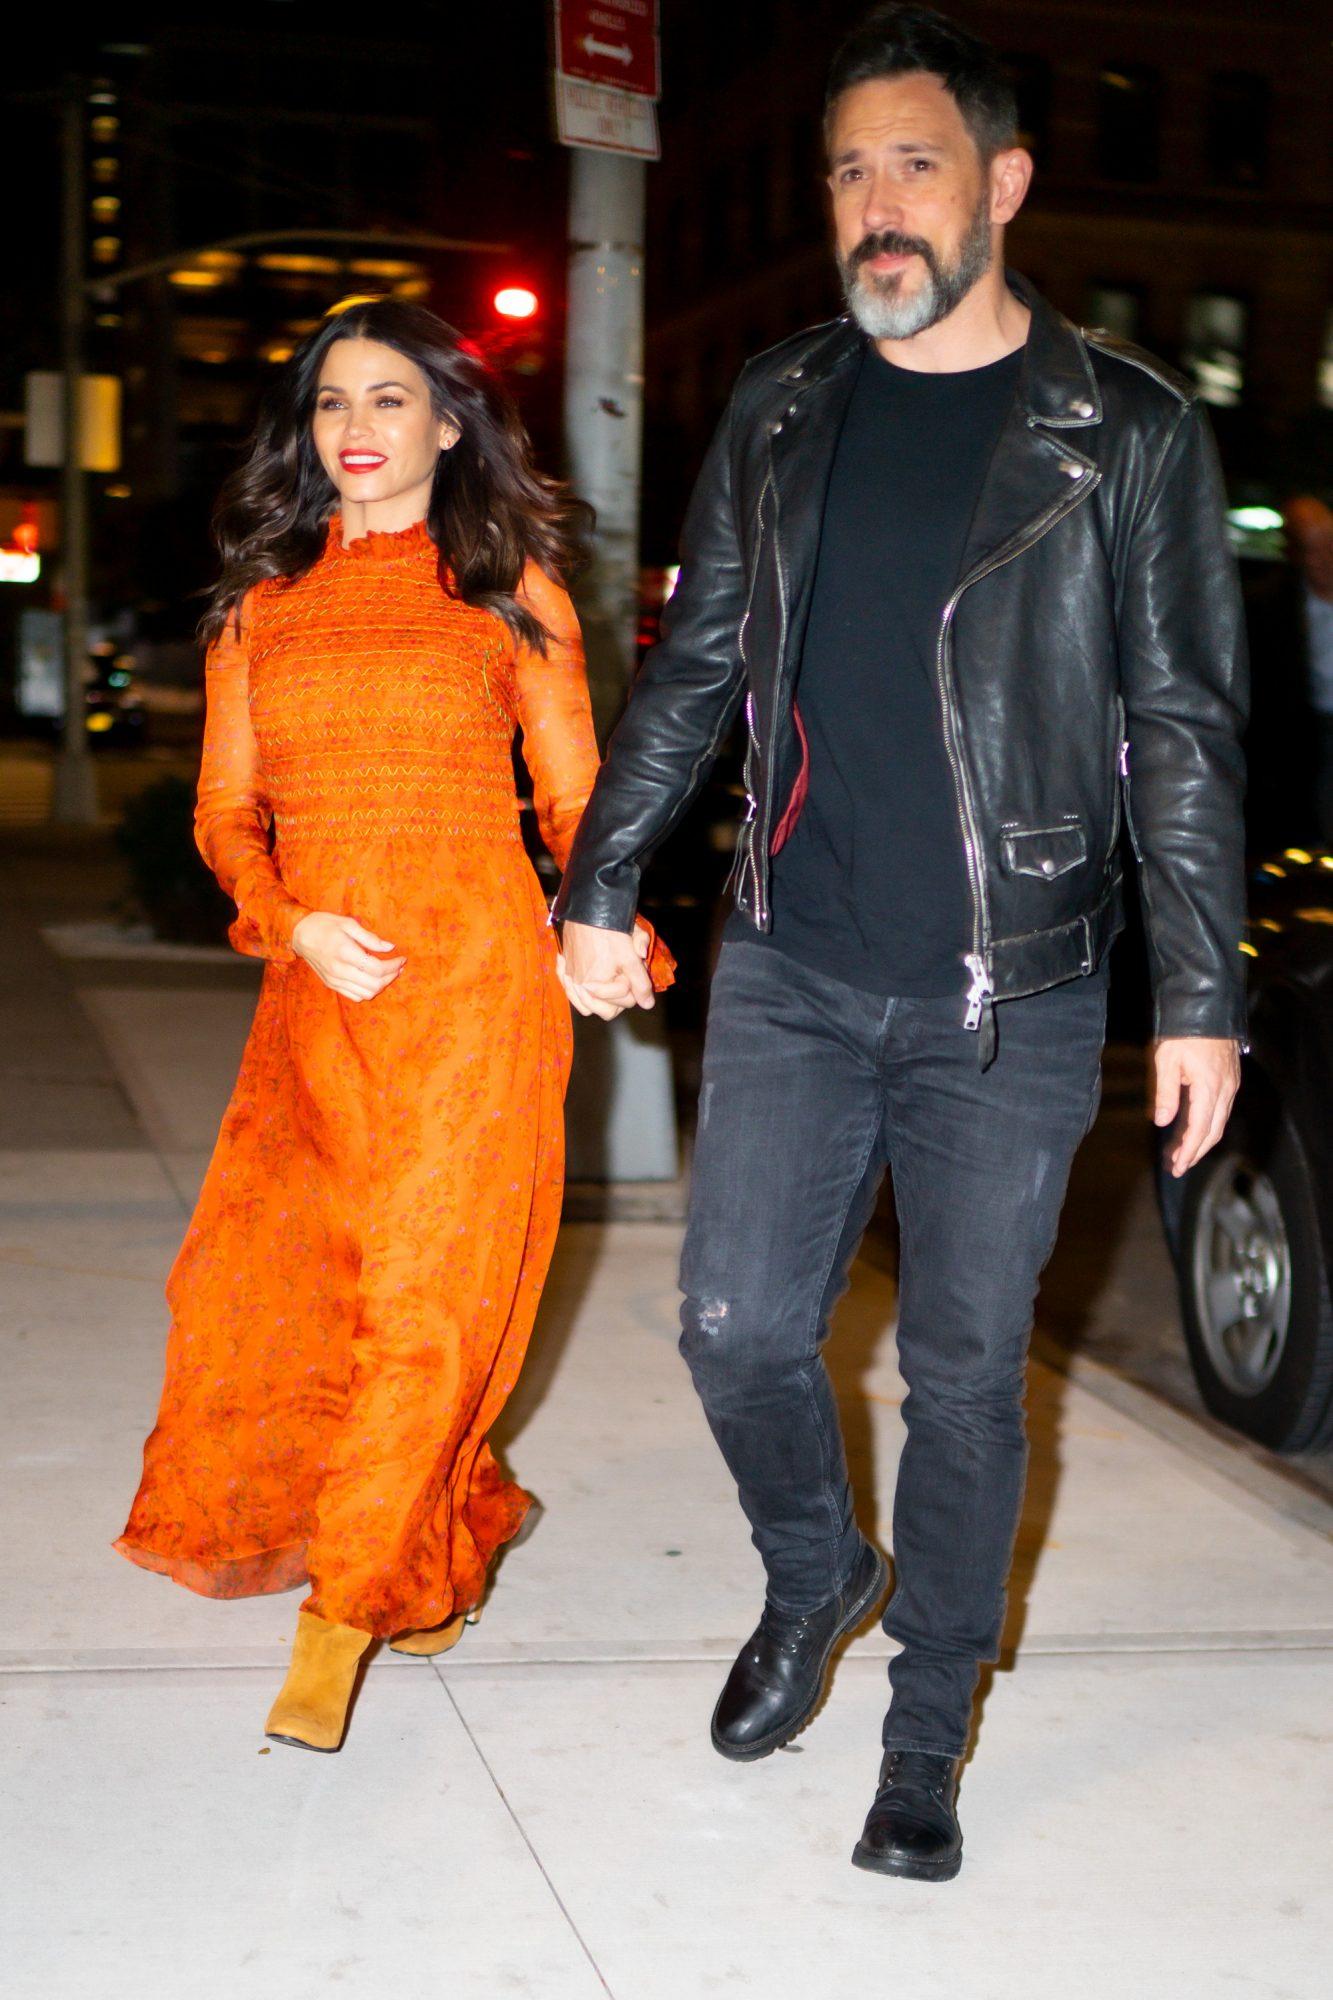 jenna dewan steve kazee walking in new york